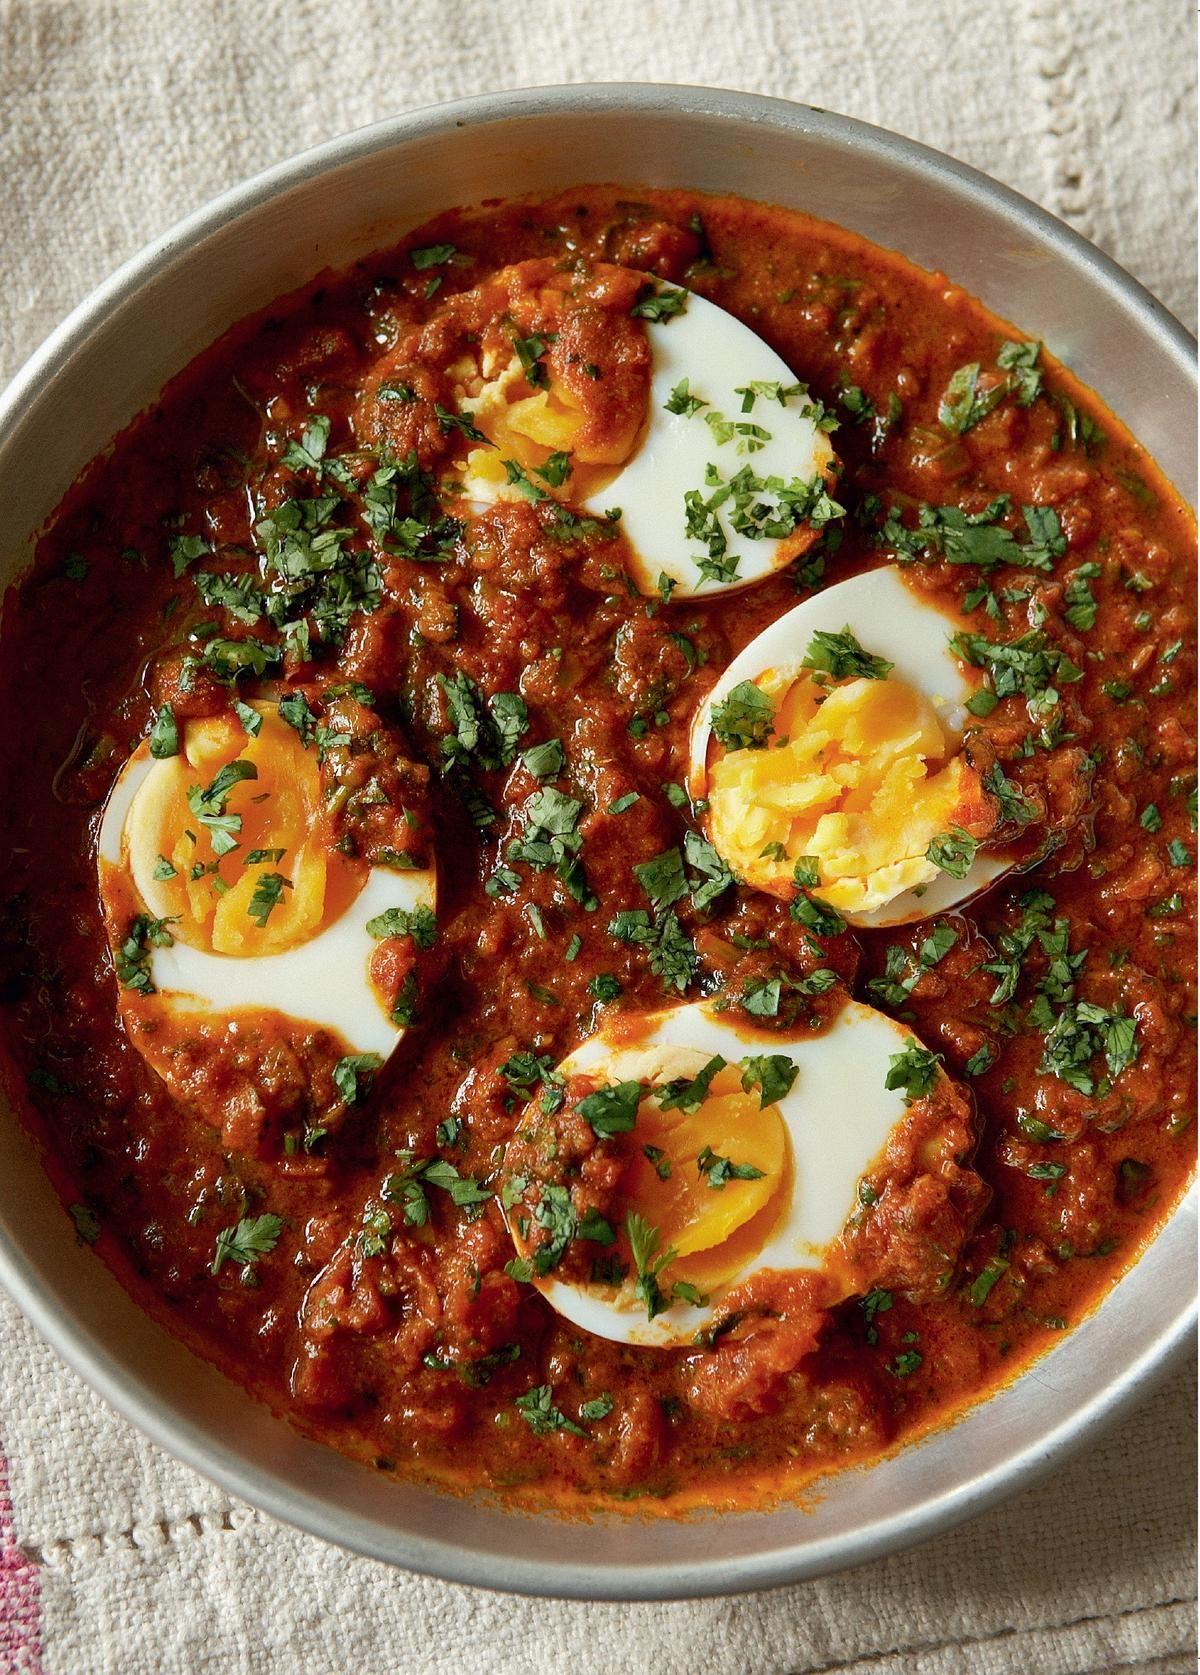 Madhur Jaffrey S Hard Boiled Eggs Masala Recipe Egg Masala Egg Recipes Indian Boiled Egg Recipes